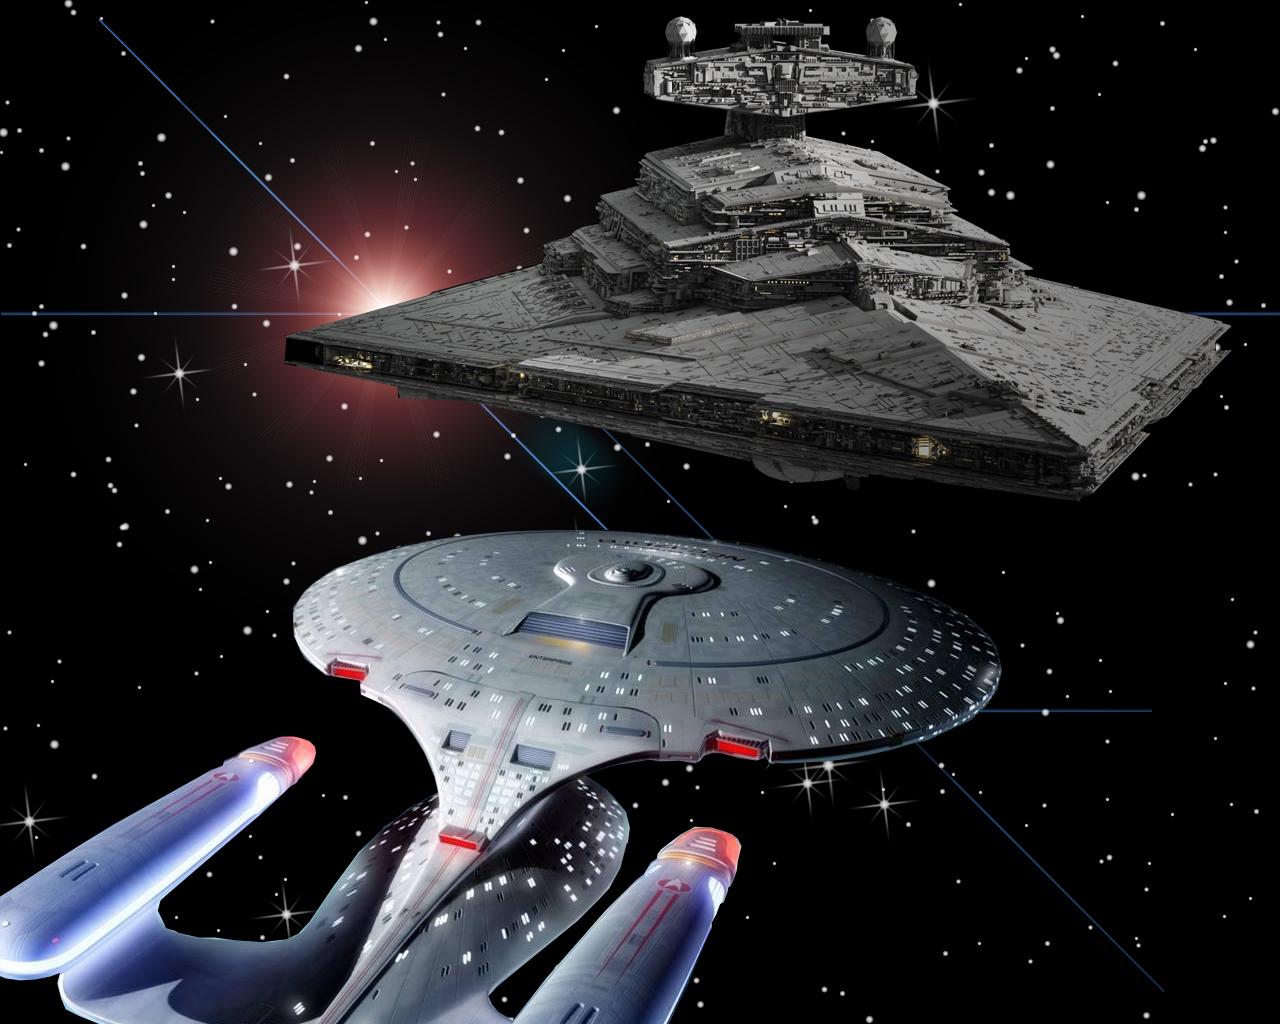 Enterprise D V Star Destroyer Star Trek Fans Wallpaper 12126227 Fanpop